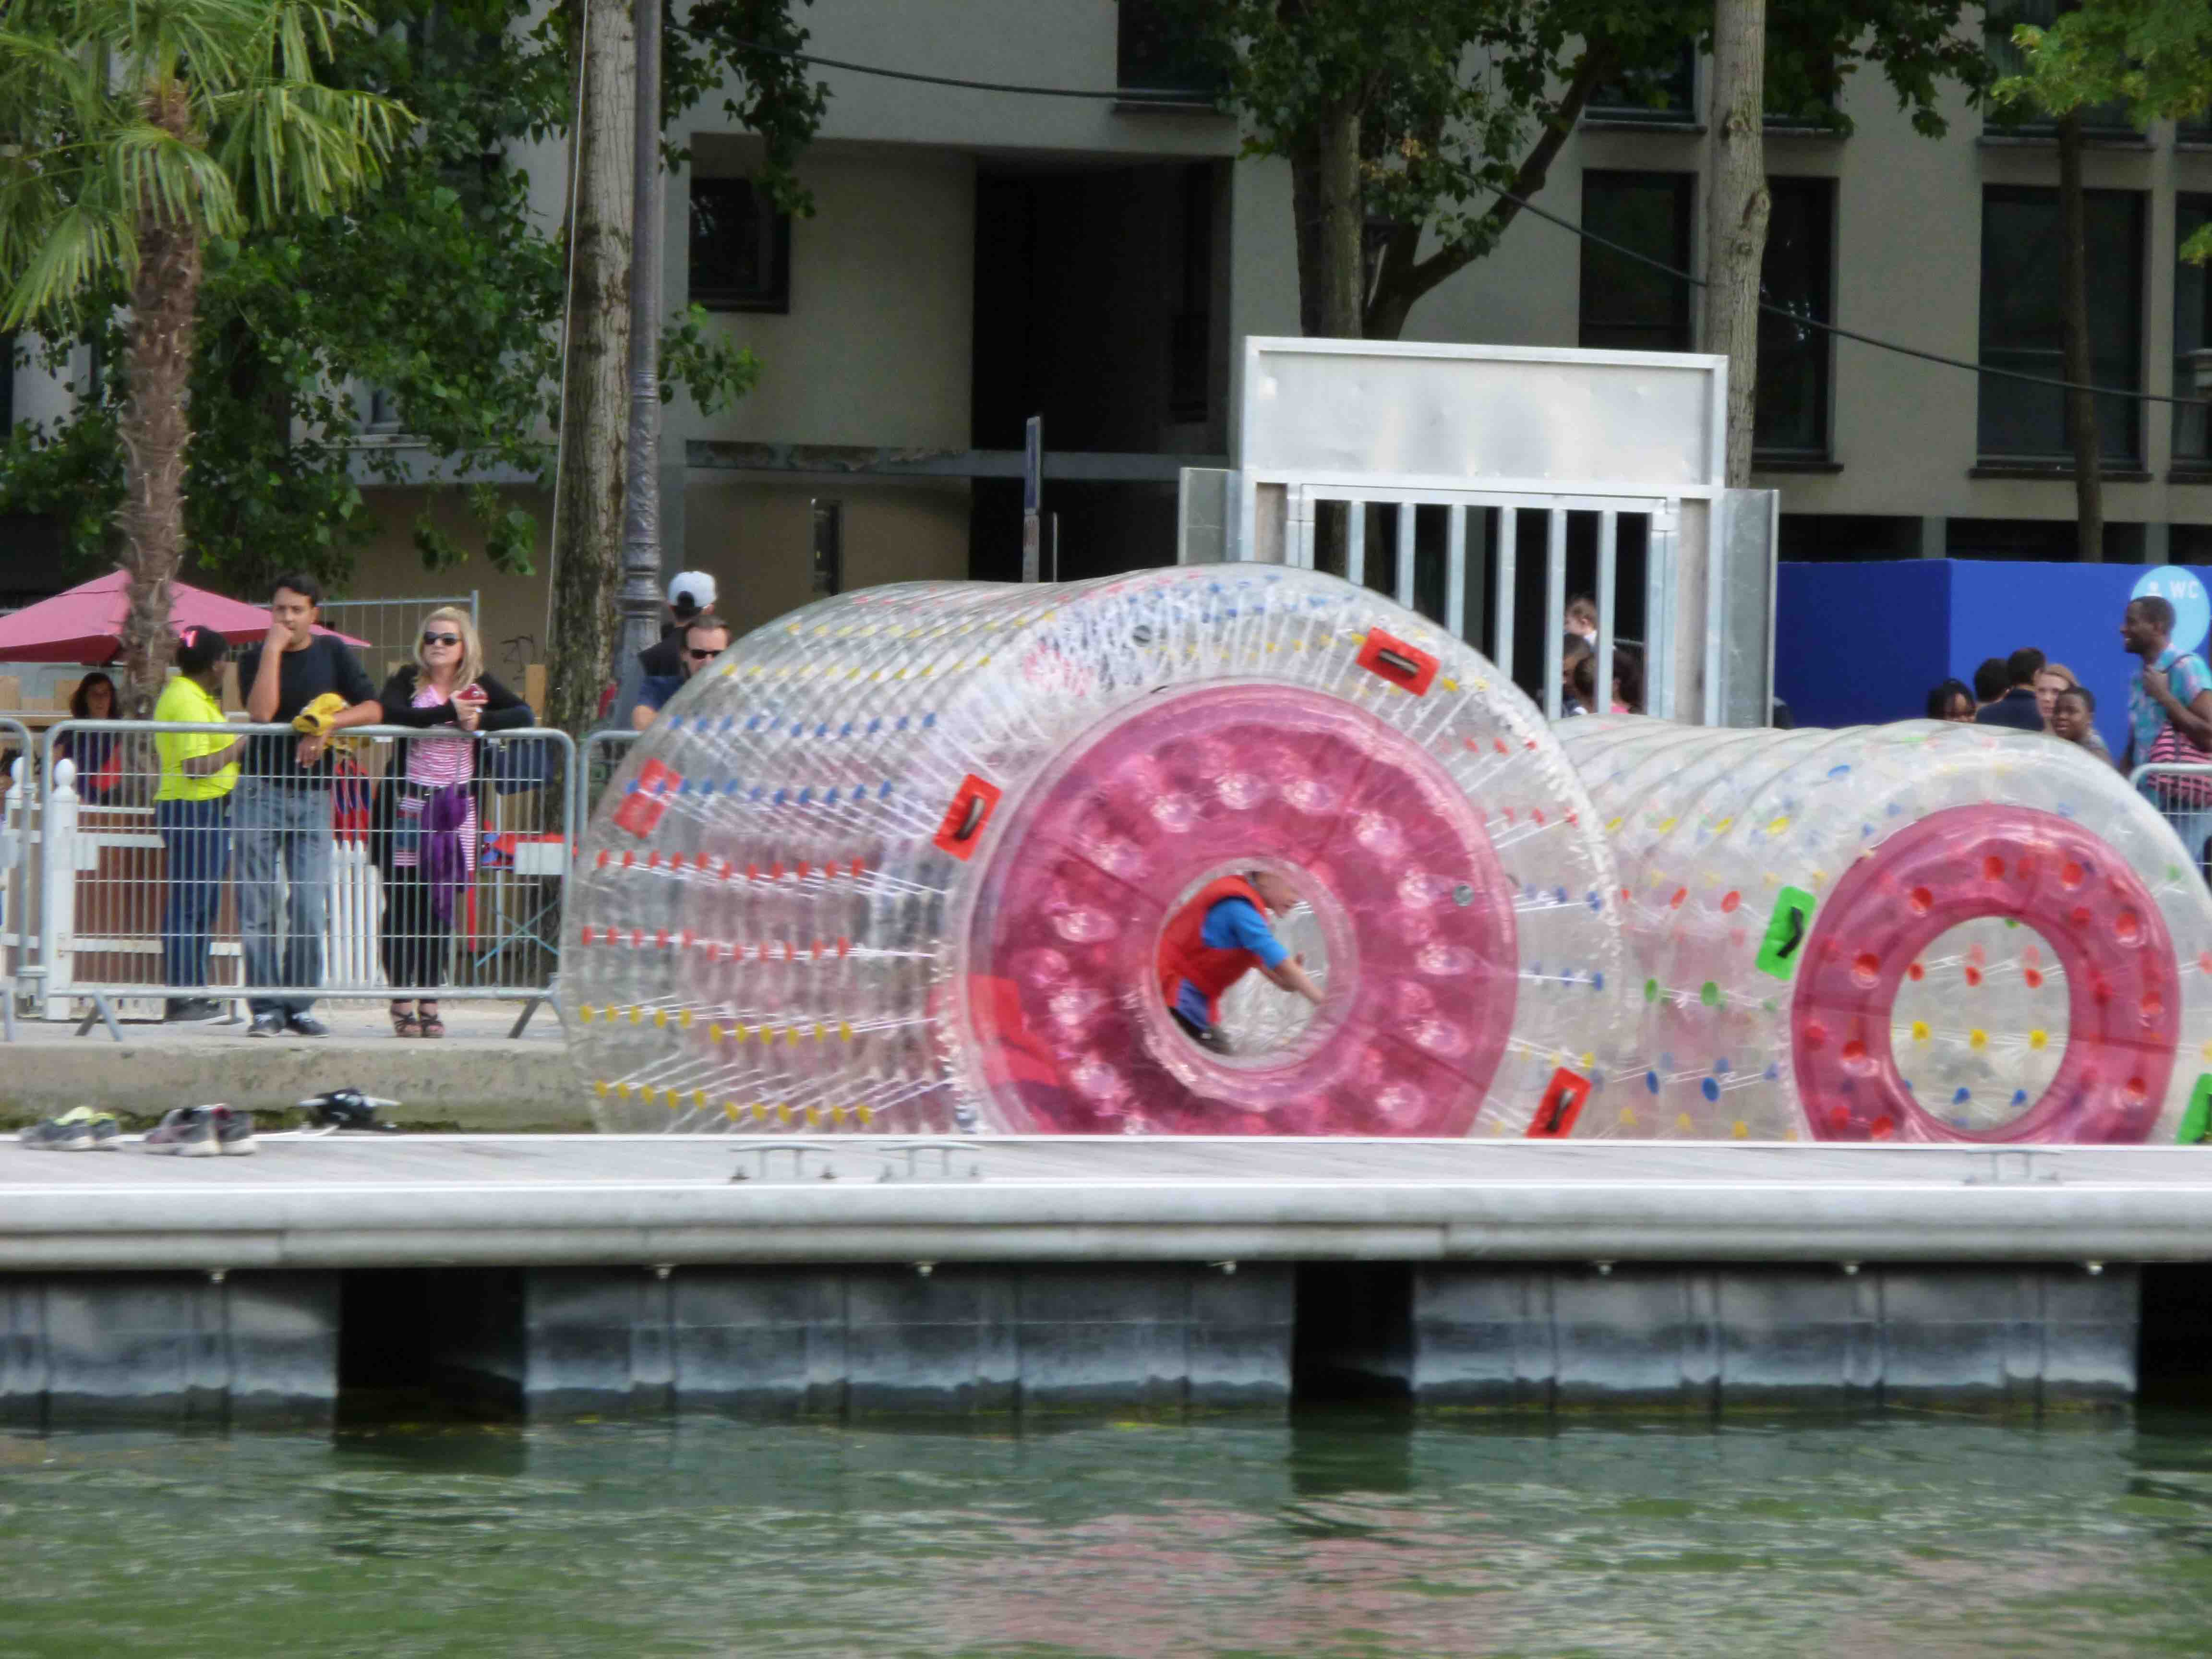 Huge inflatables